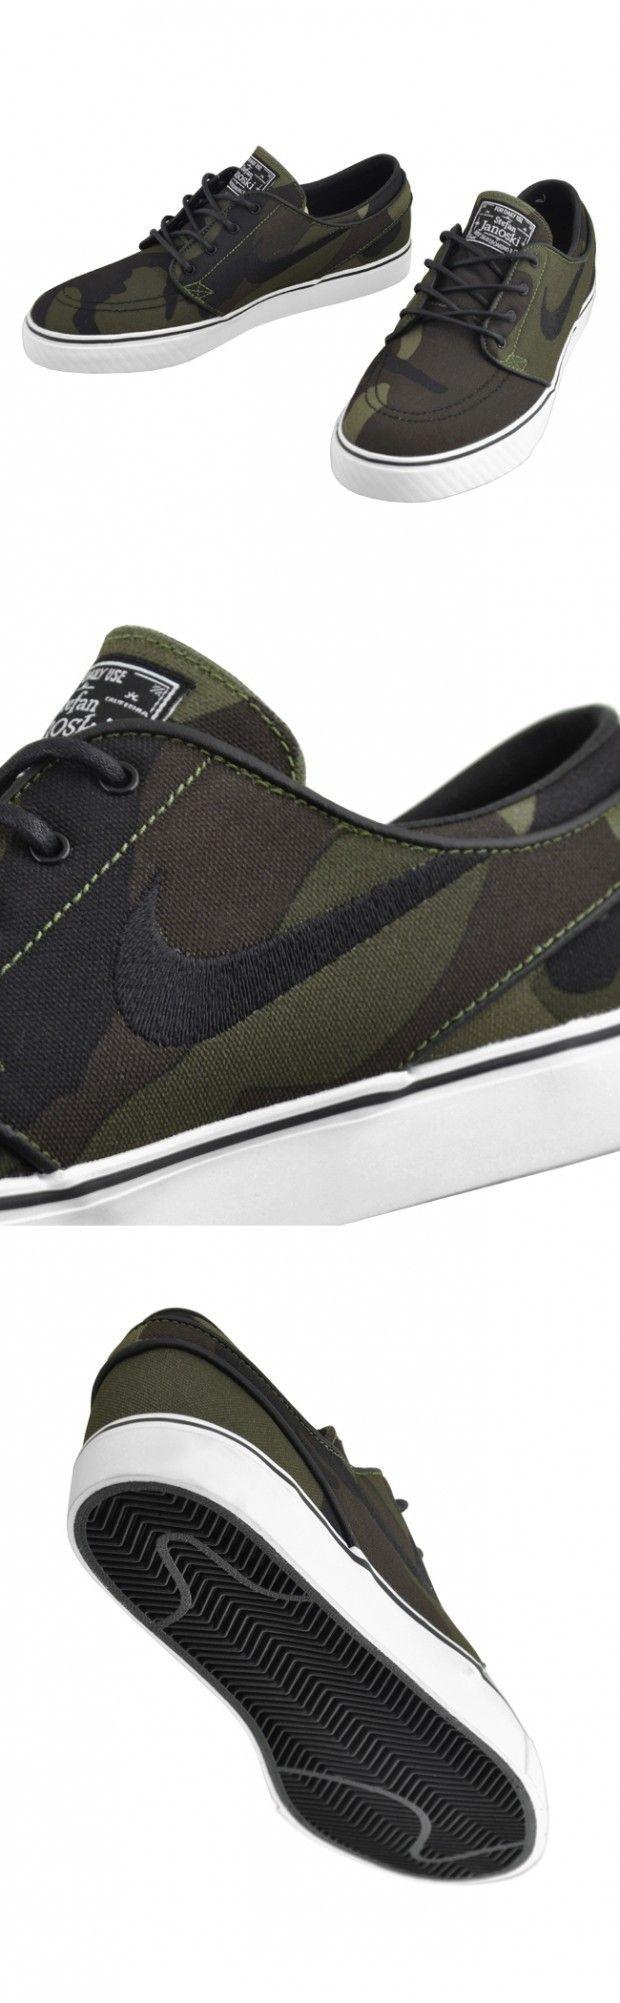 Nike-SB-Stefan-Janoski-Camo-Another-Look-2